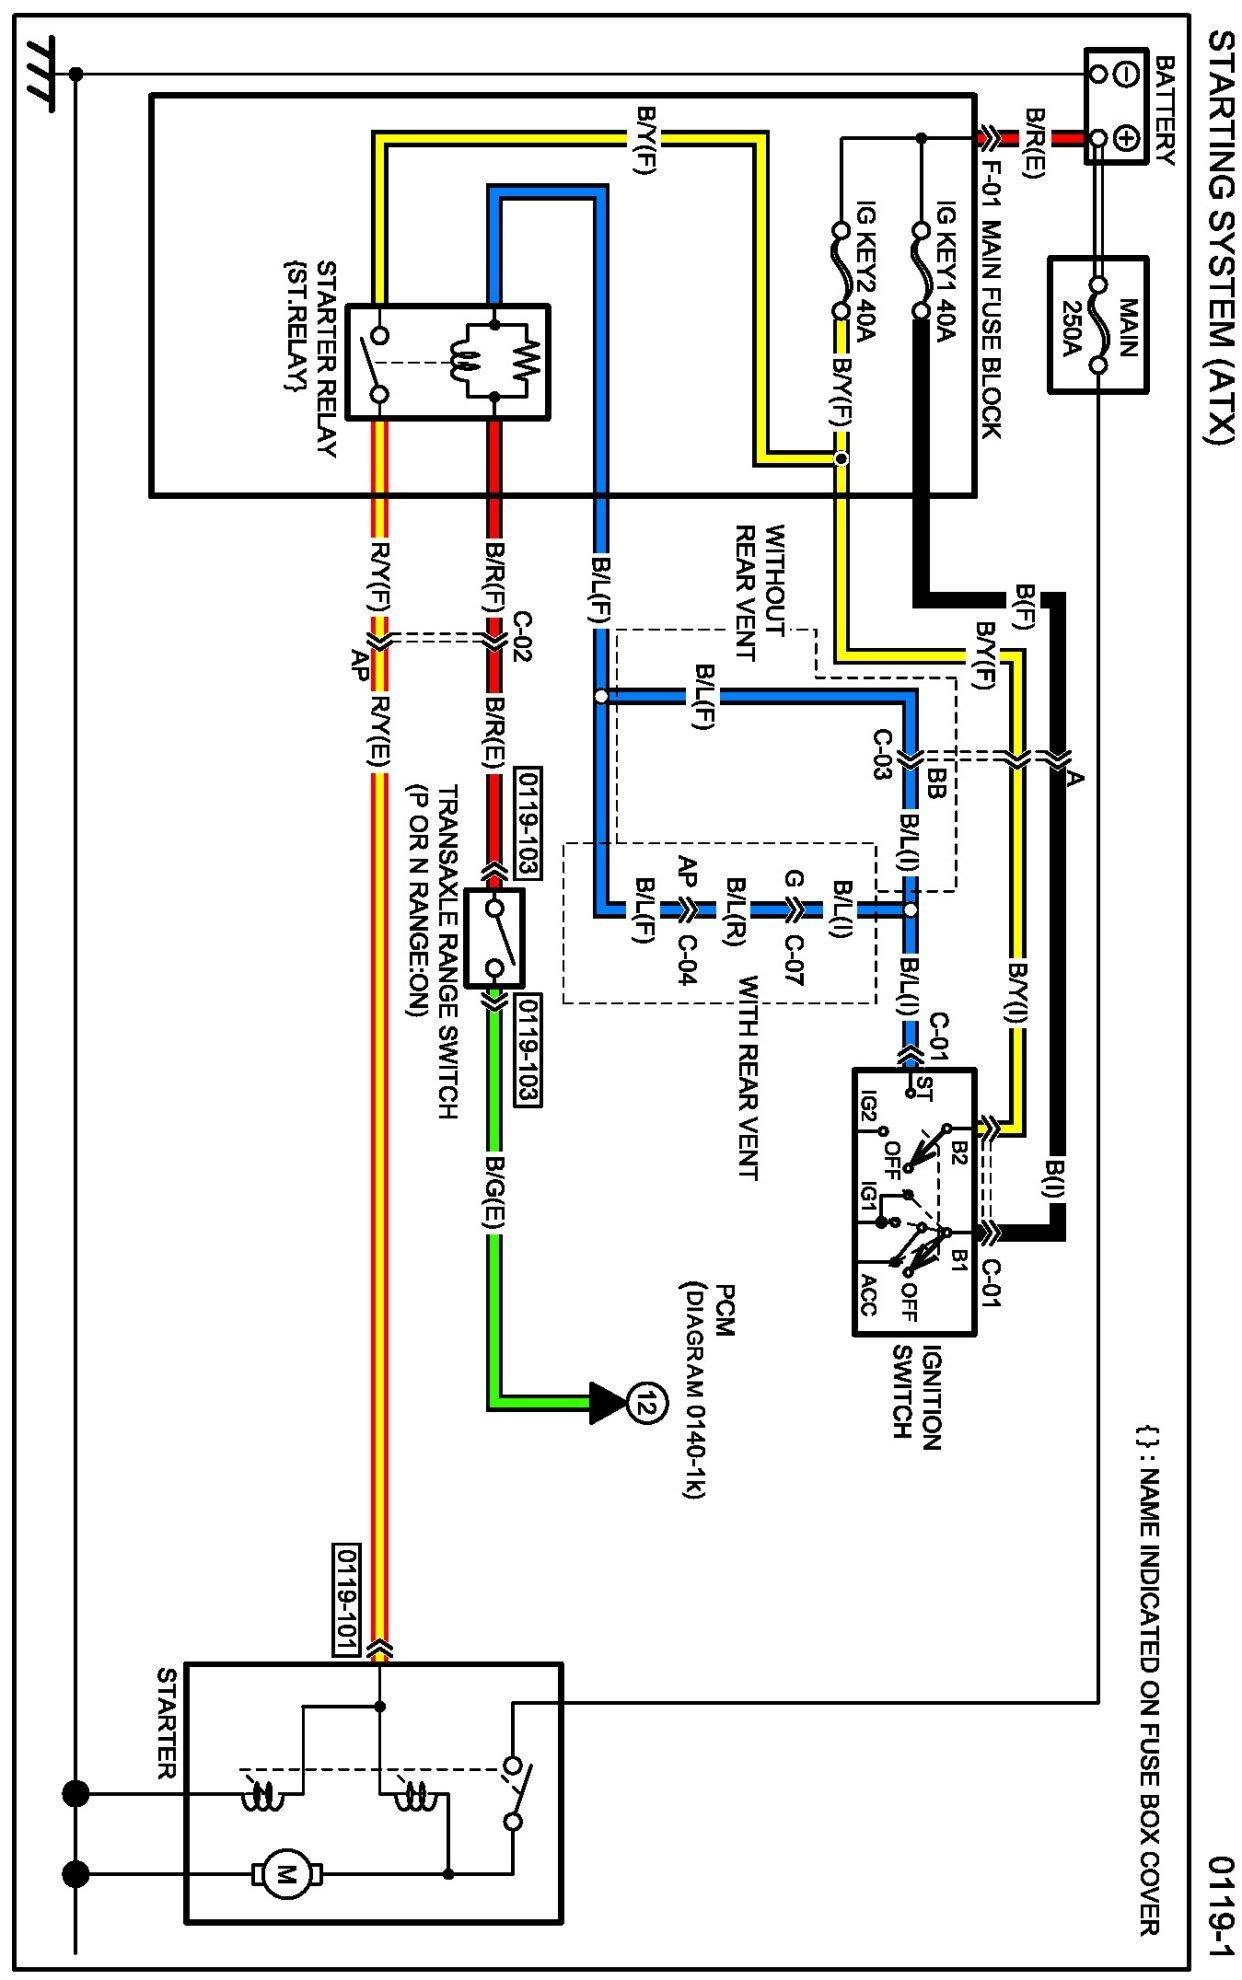 Diagram Enterview 5 Wiring Diagram